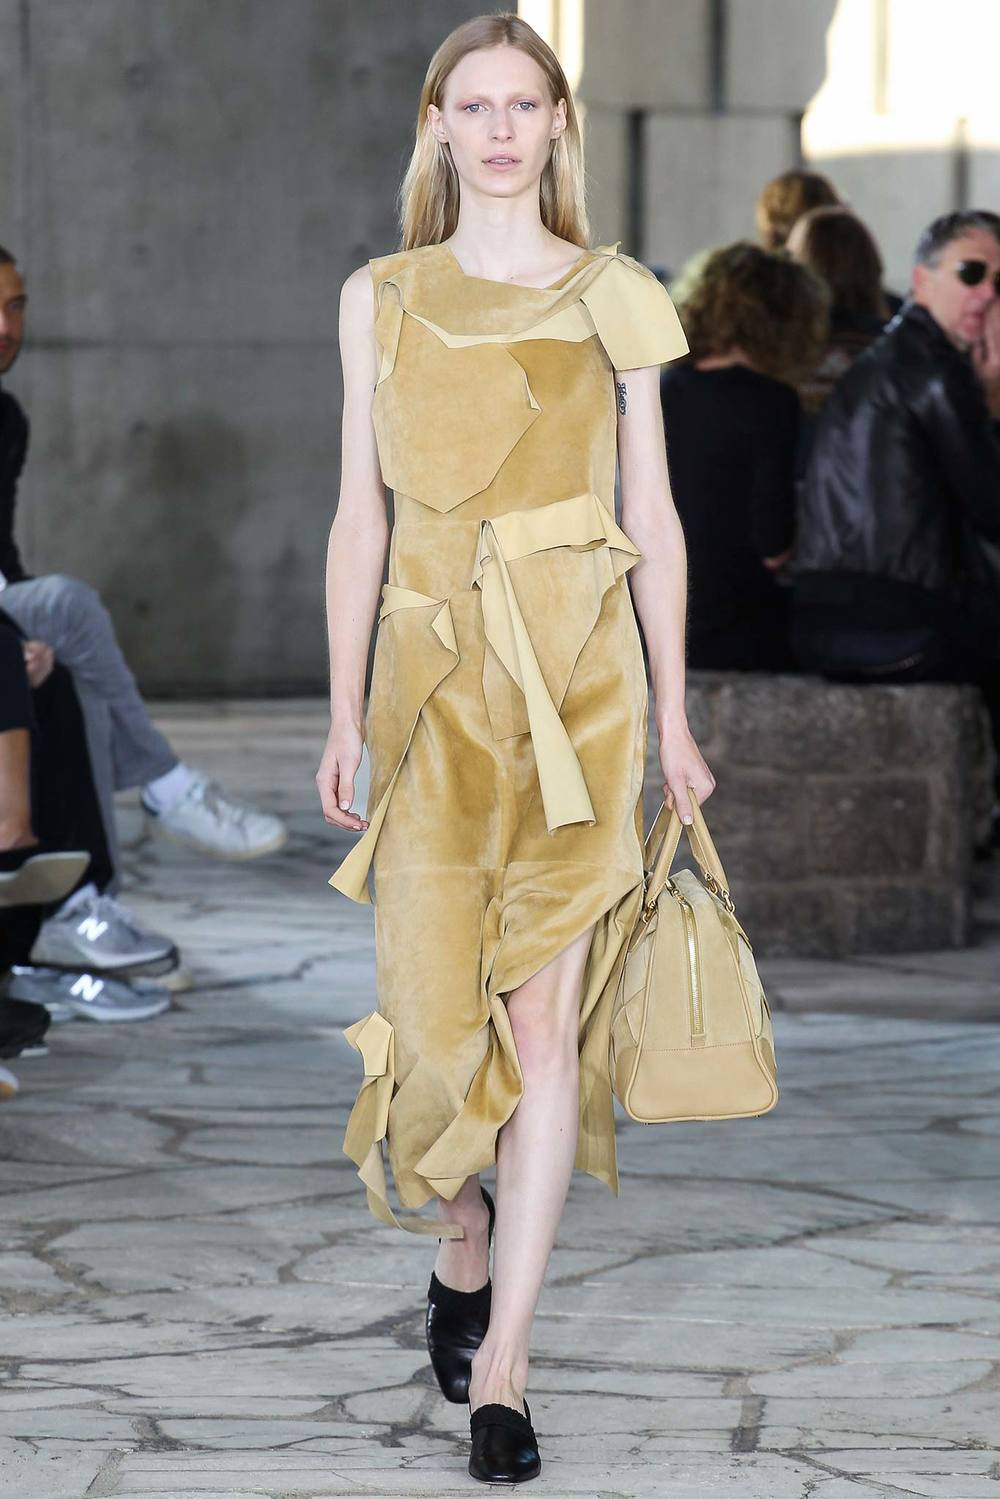 Loewe s/s 2015, look 1. Source: Style.com